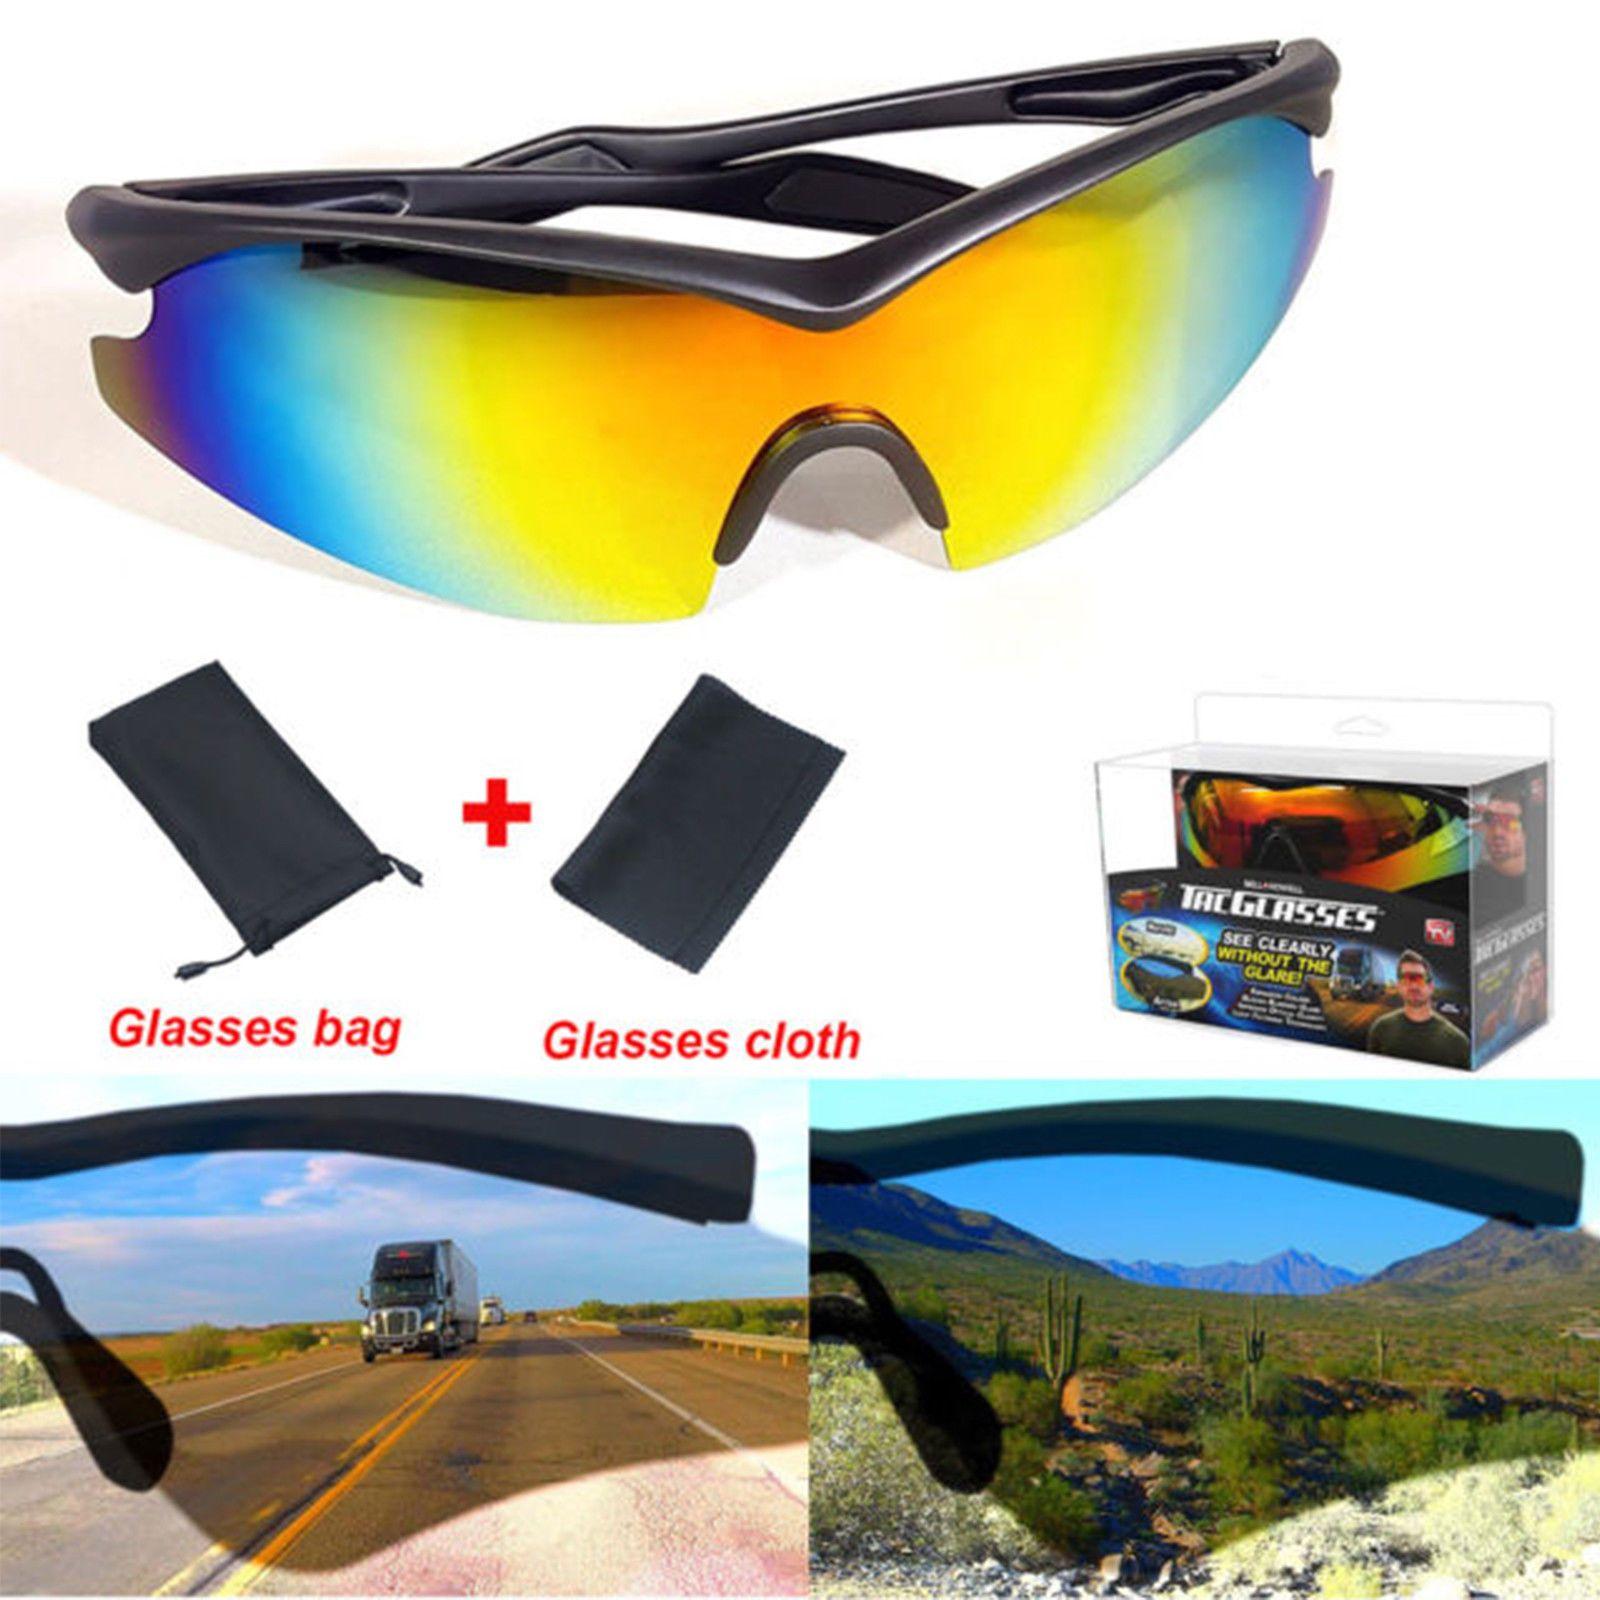 df77878d7ba  14.95 - Bell   Howell Tac Glasses Sports Polarized Military Style  Sunglasses Anti Glare  ebay  Fashion